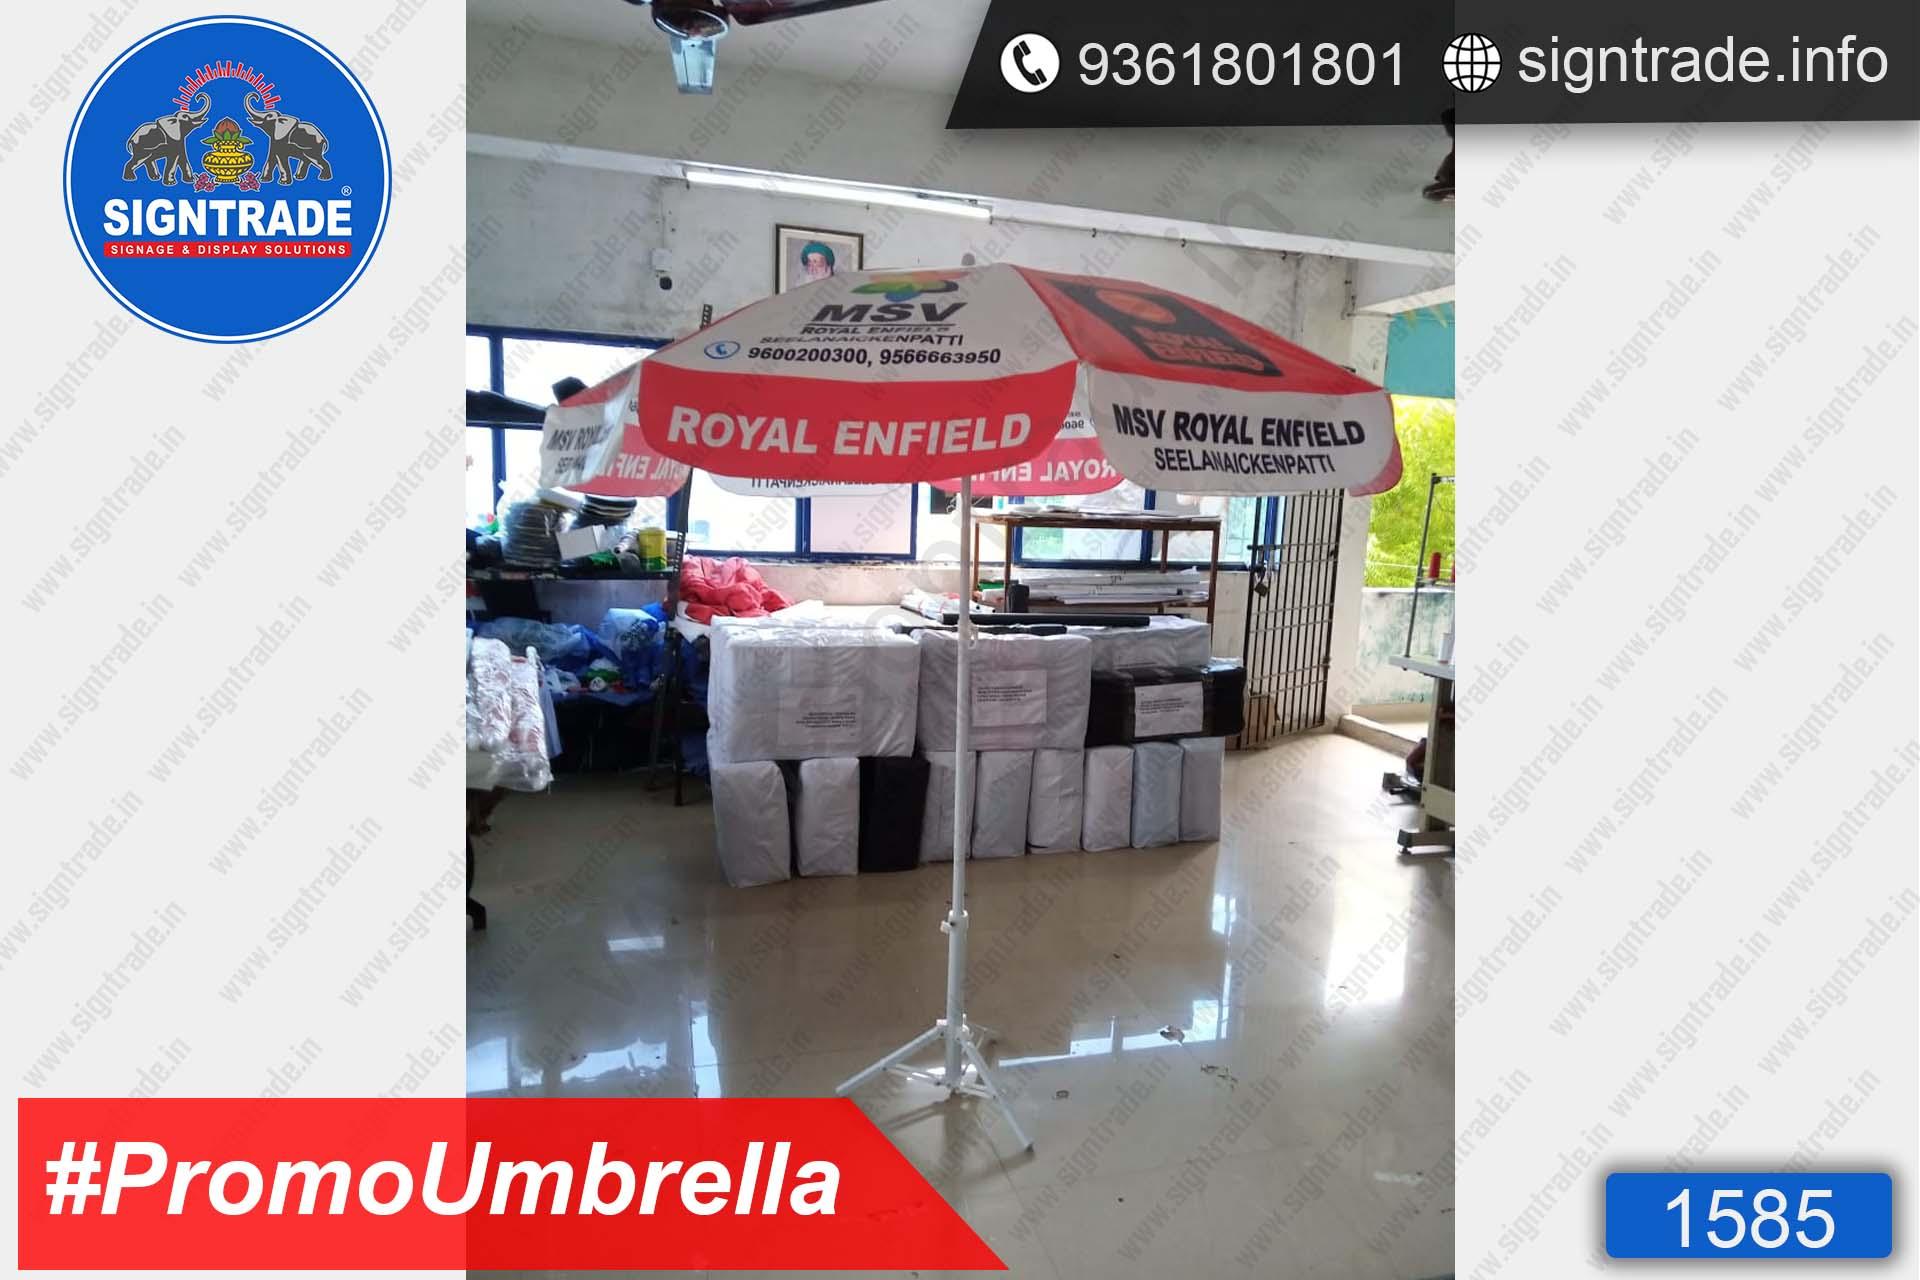 MSV Royal Enfield, Seelanaickenpatti, Chennai - SIGNTRADE - Promotional Umbrella Manufactures in Chennai